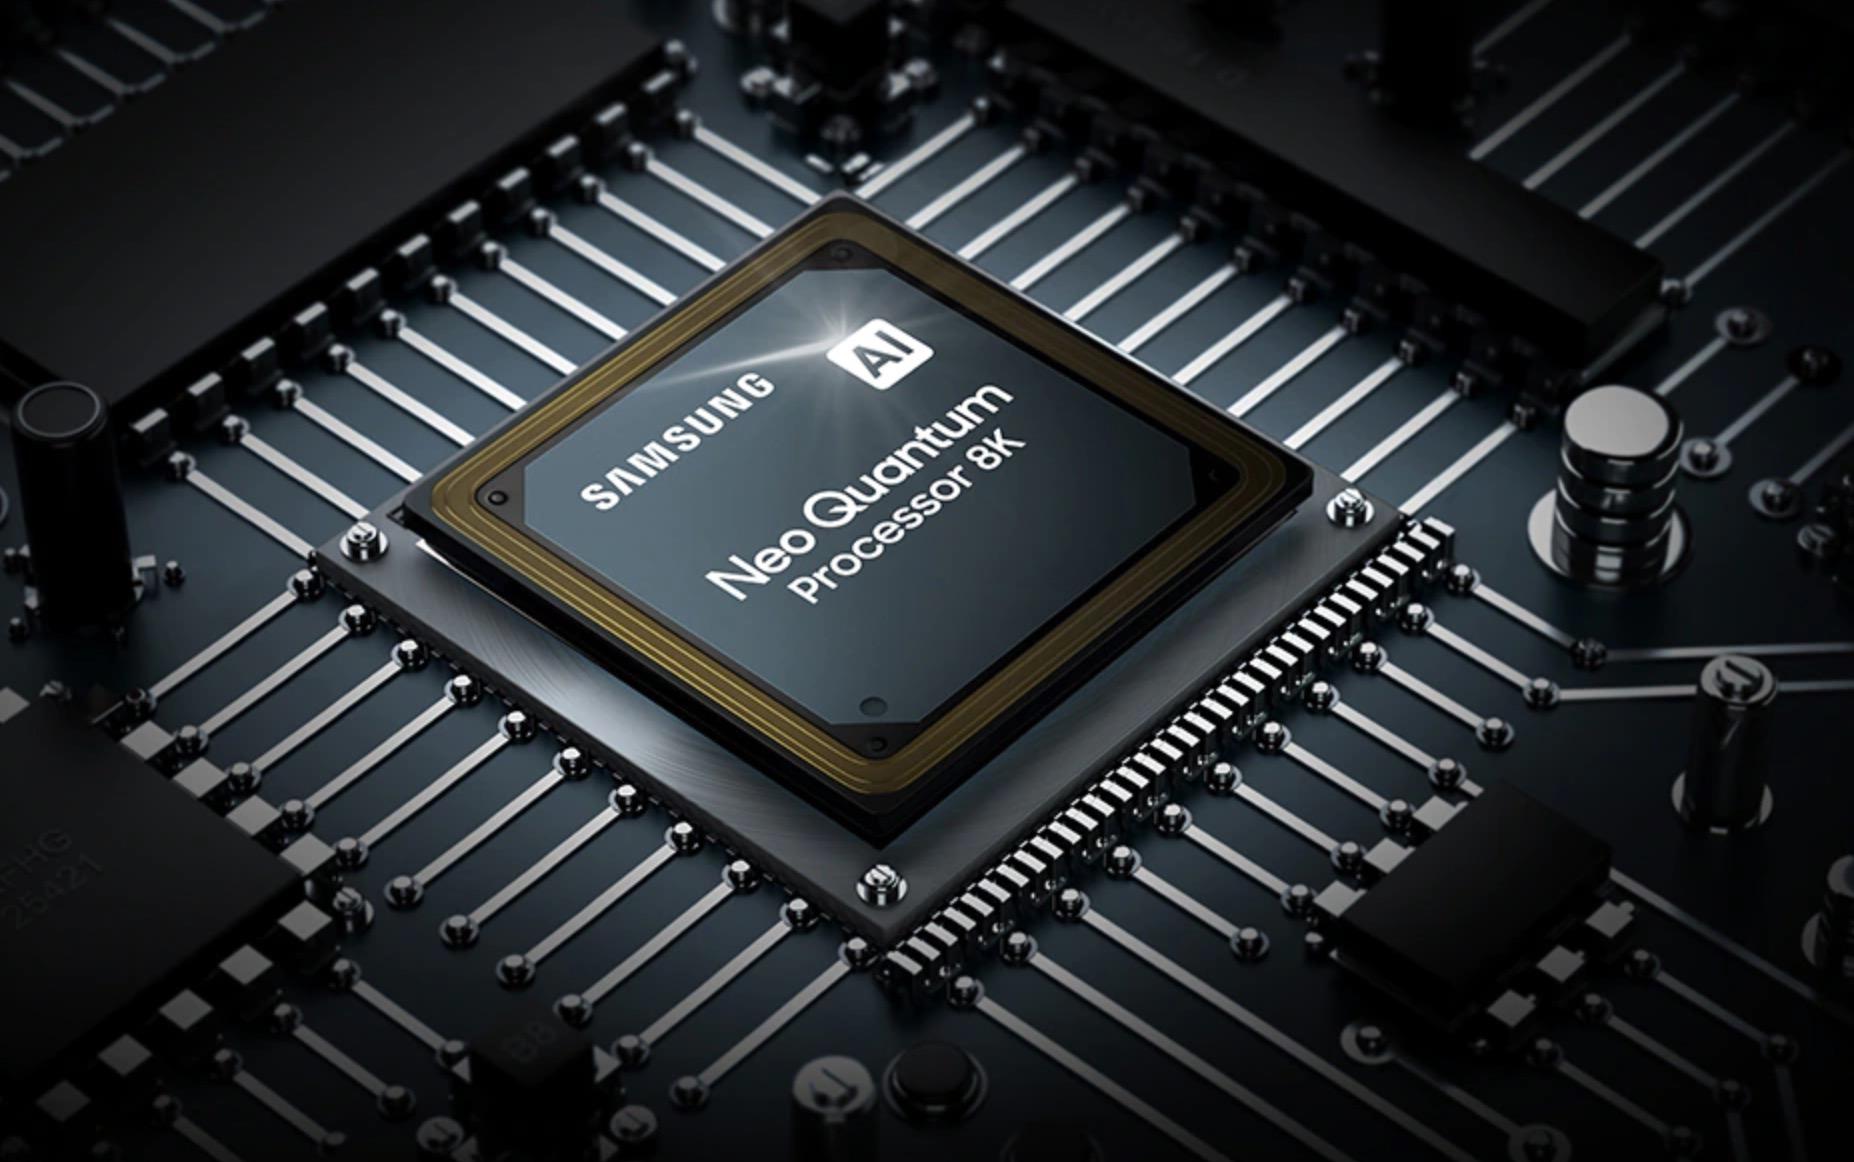 Processeur Neo Quantum de Samsung